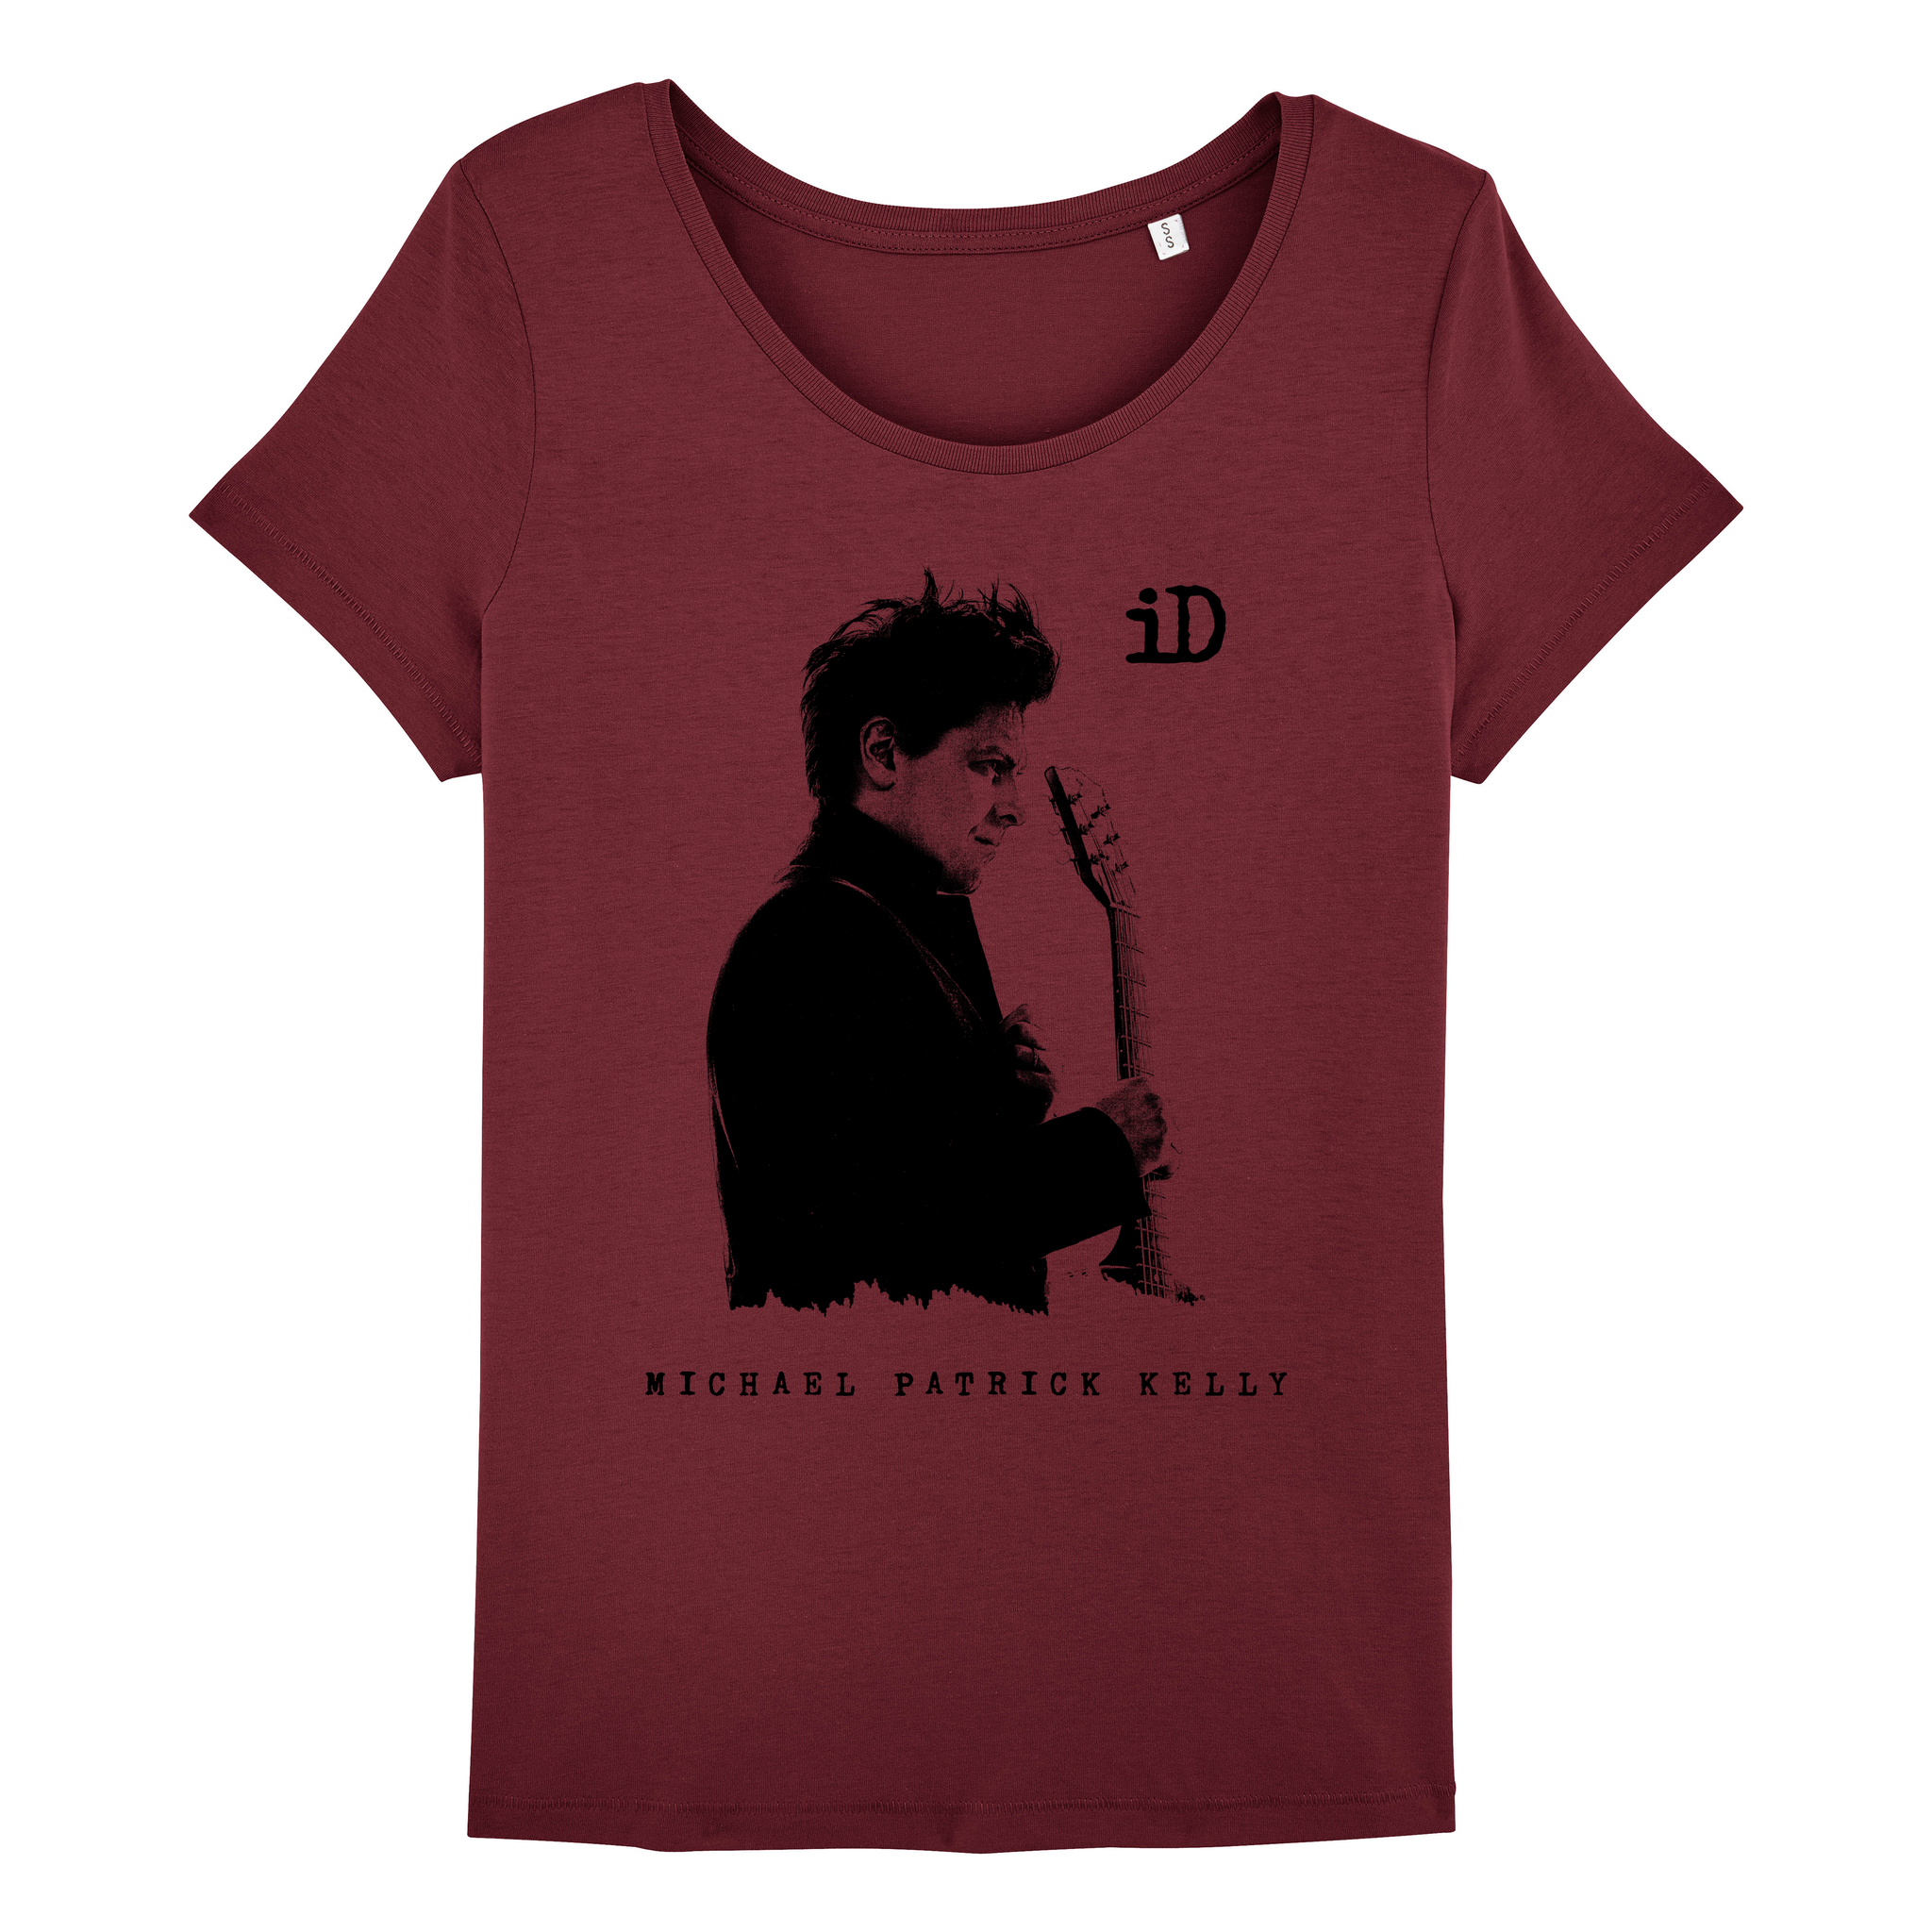 "Stella Wants Women's T-Shirt ""iD"" burgundy made of organic cotton"